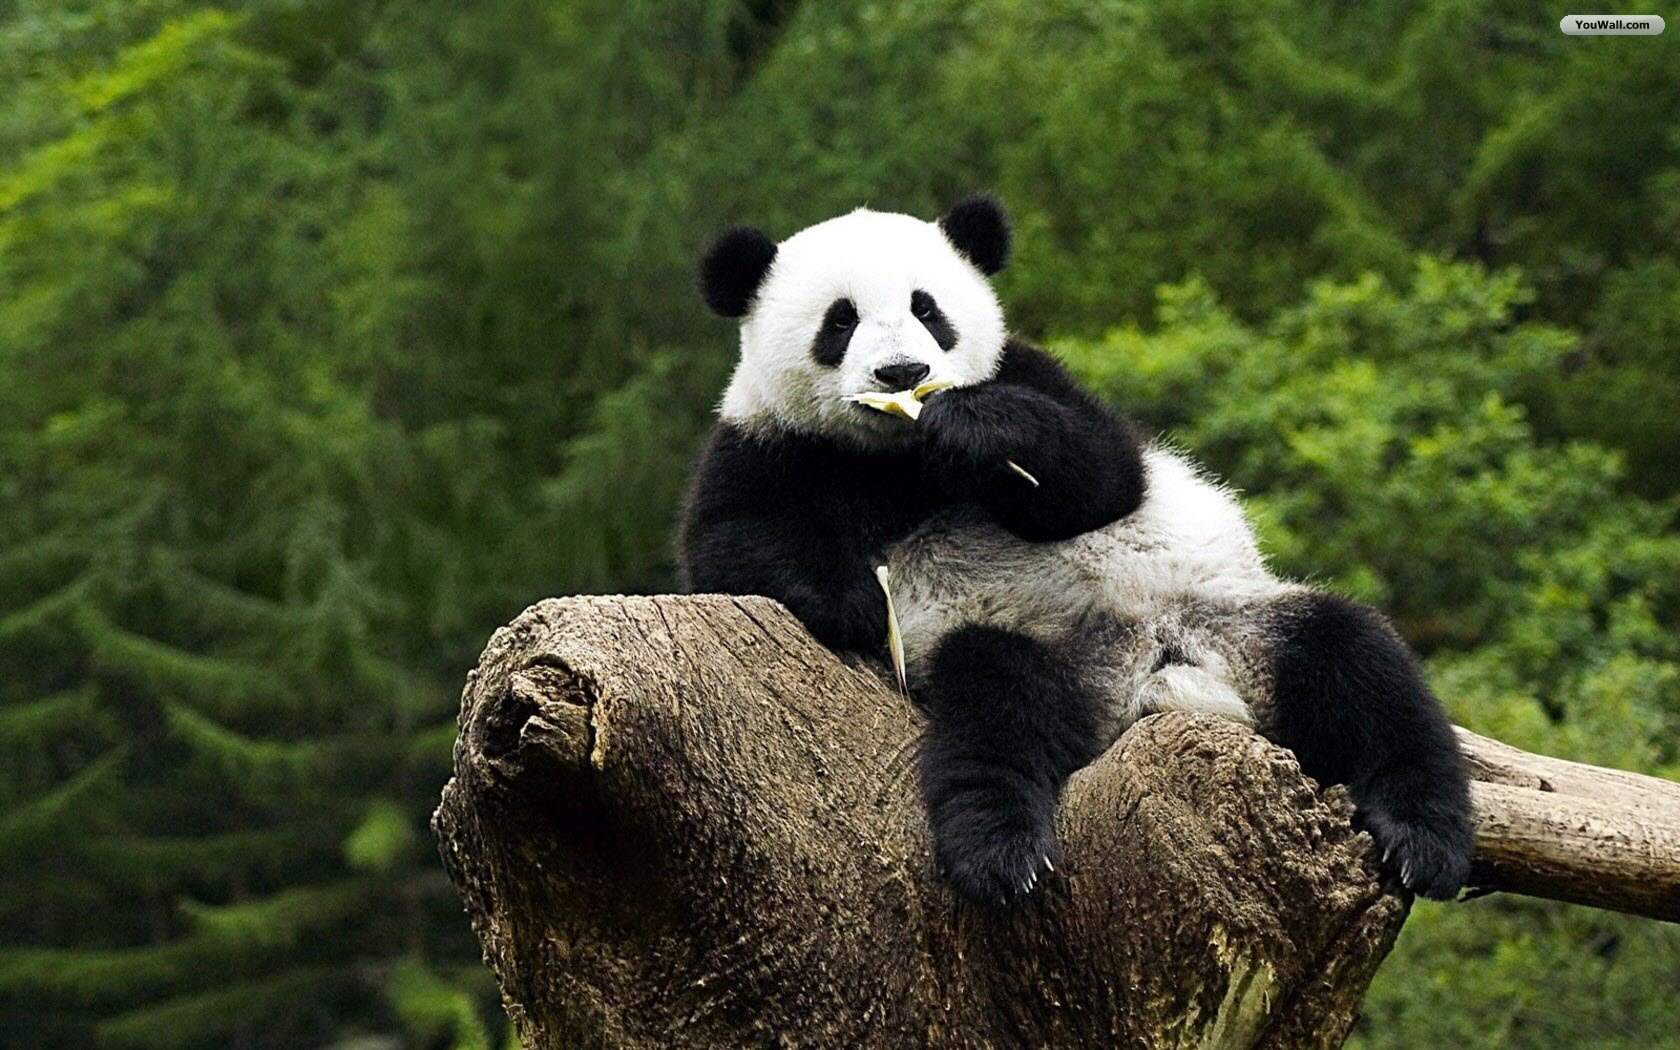 Panda Background Hd Wallpaper  Important Wallpapers